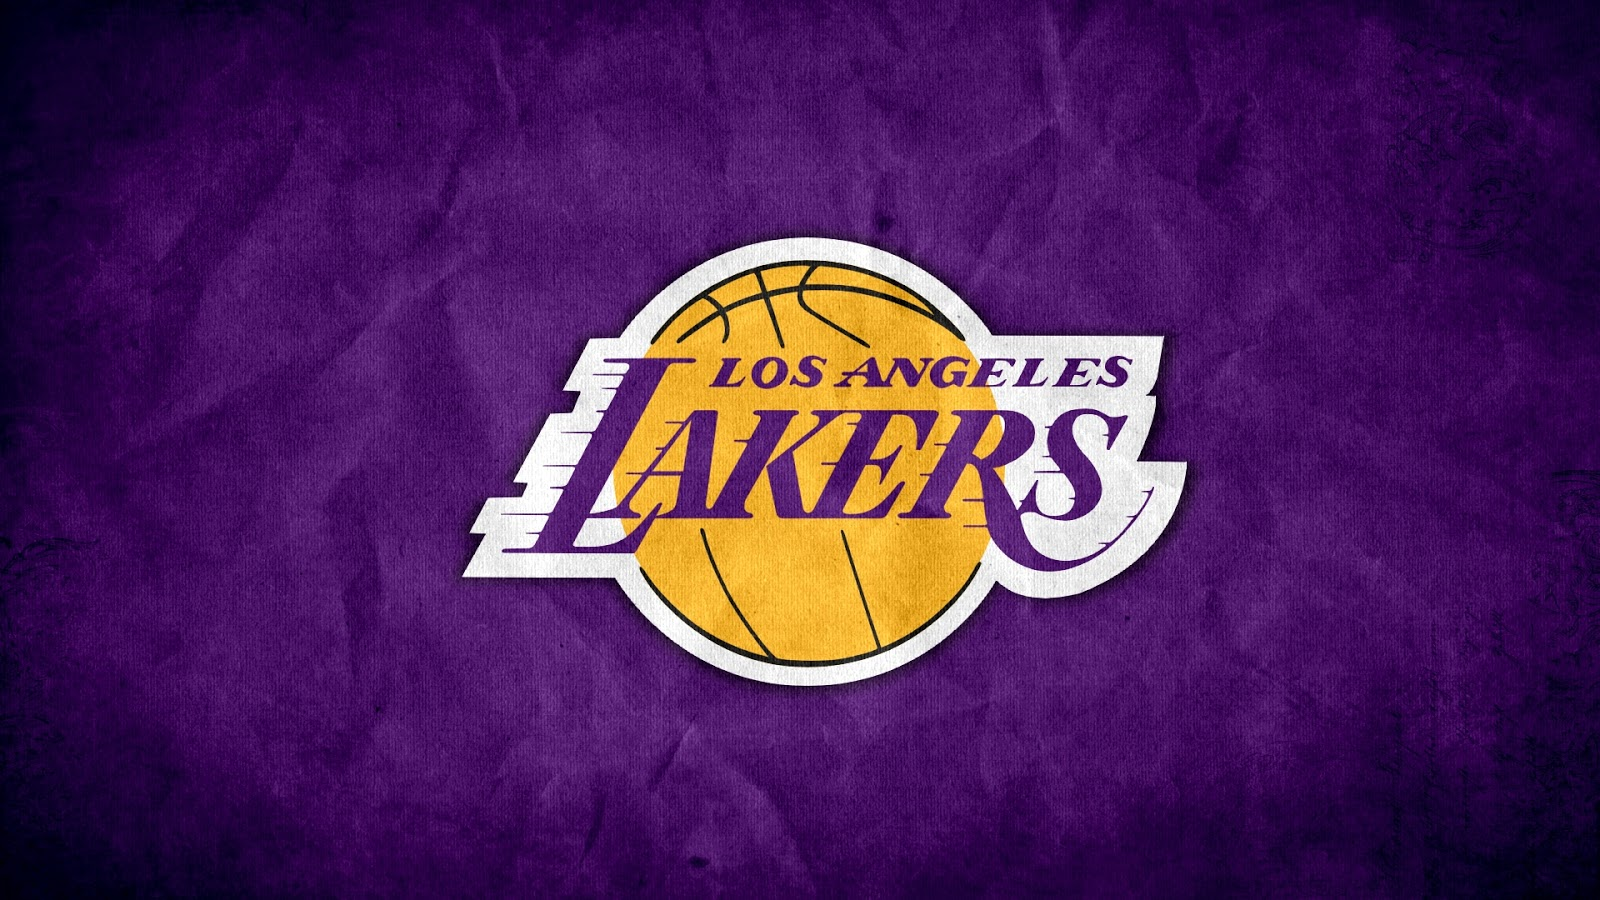 download Los Angeles Lakers Wallpaper HD Wallpaper 1600x900